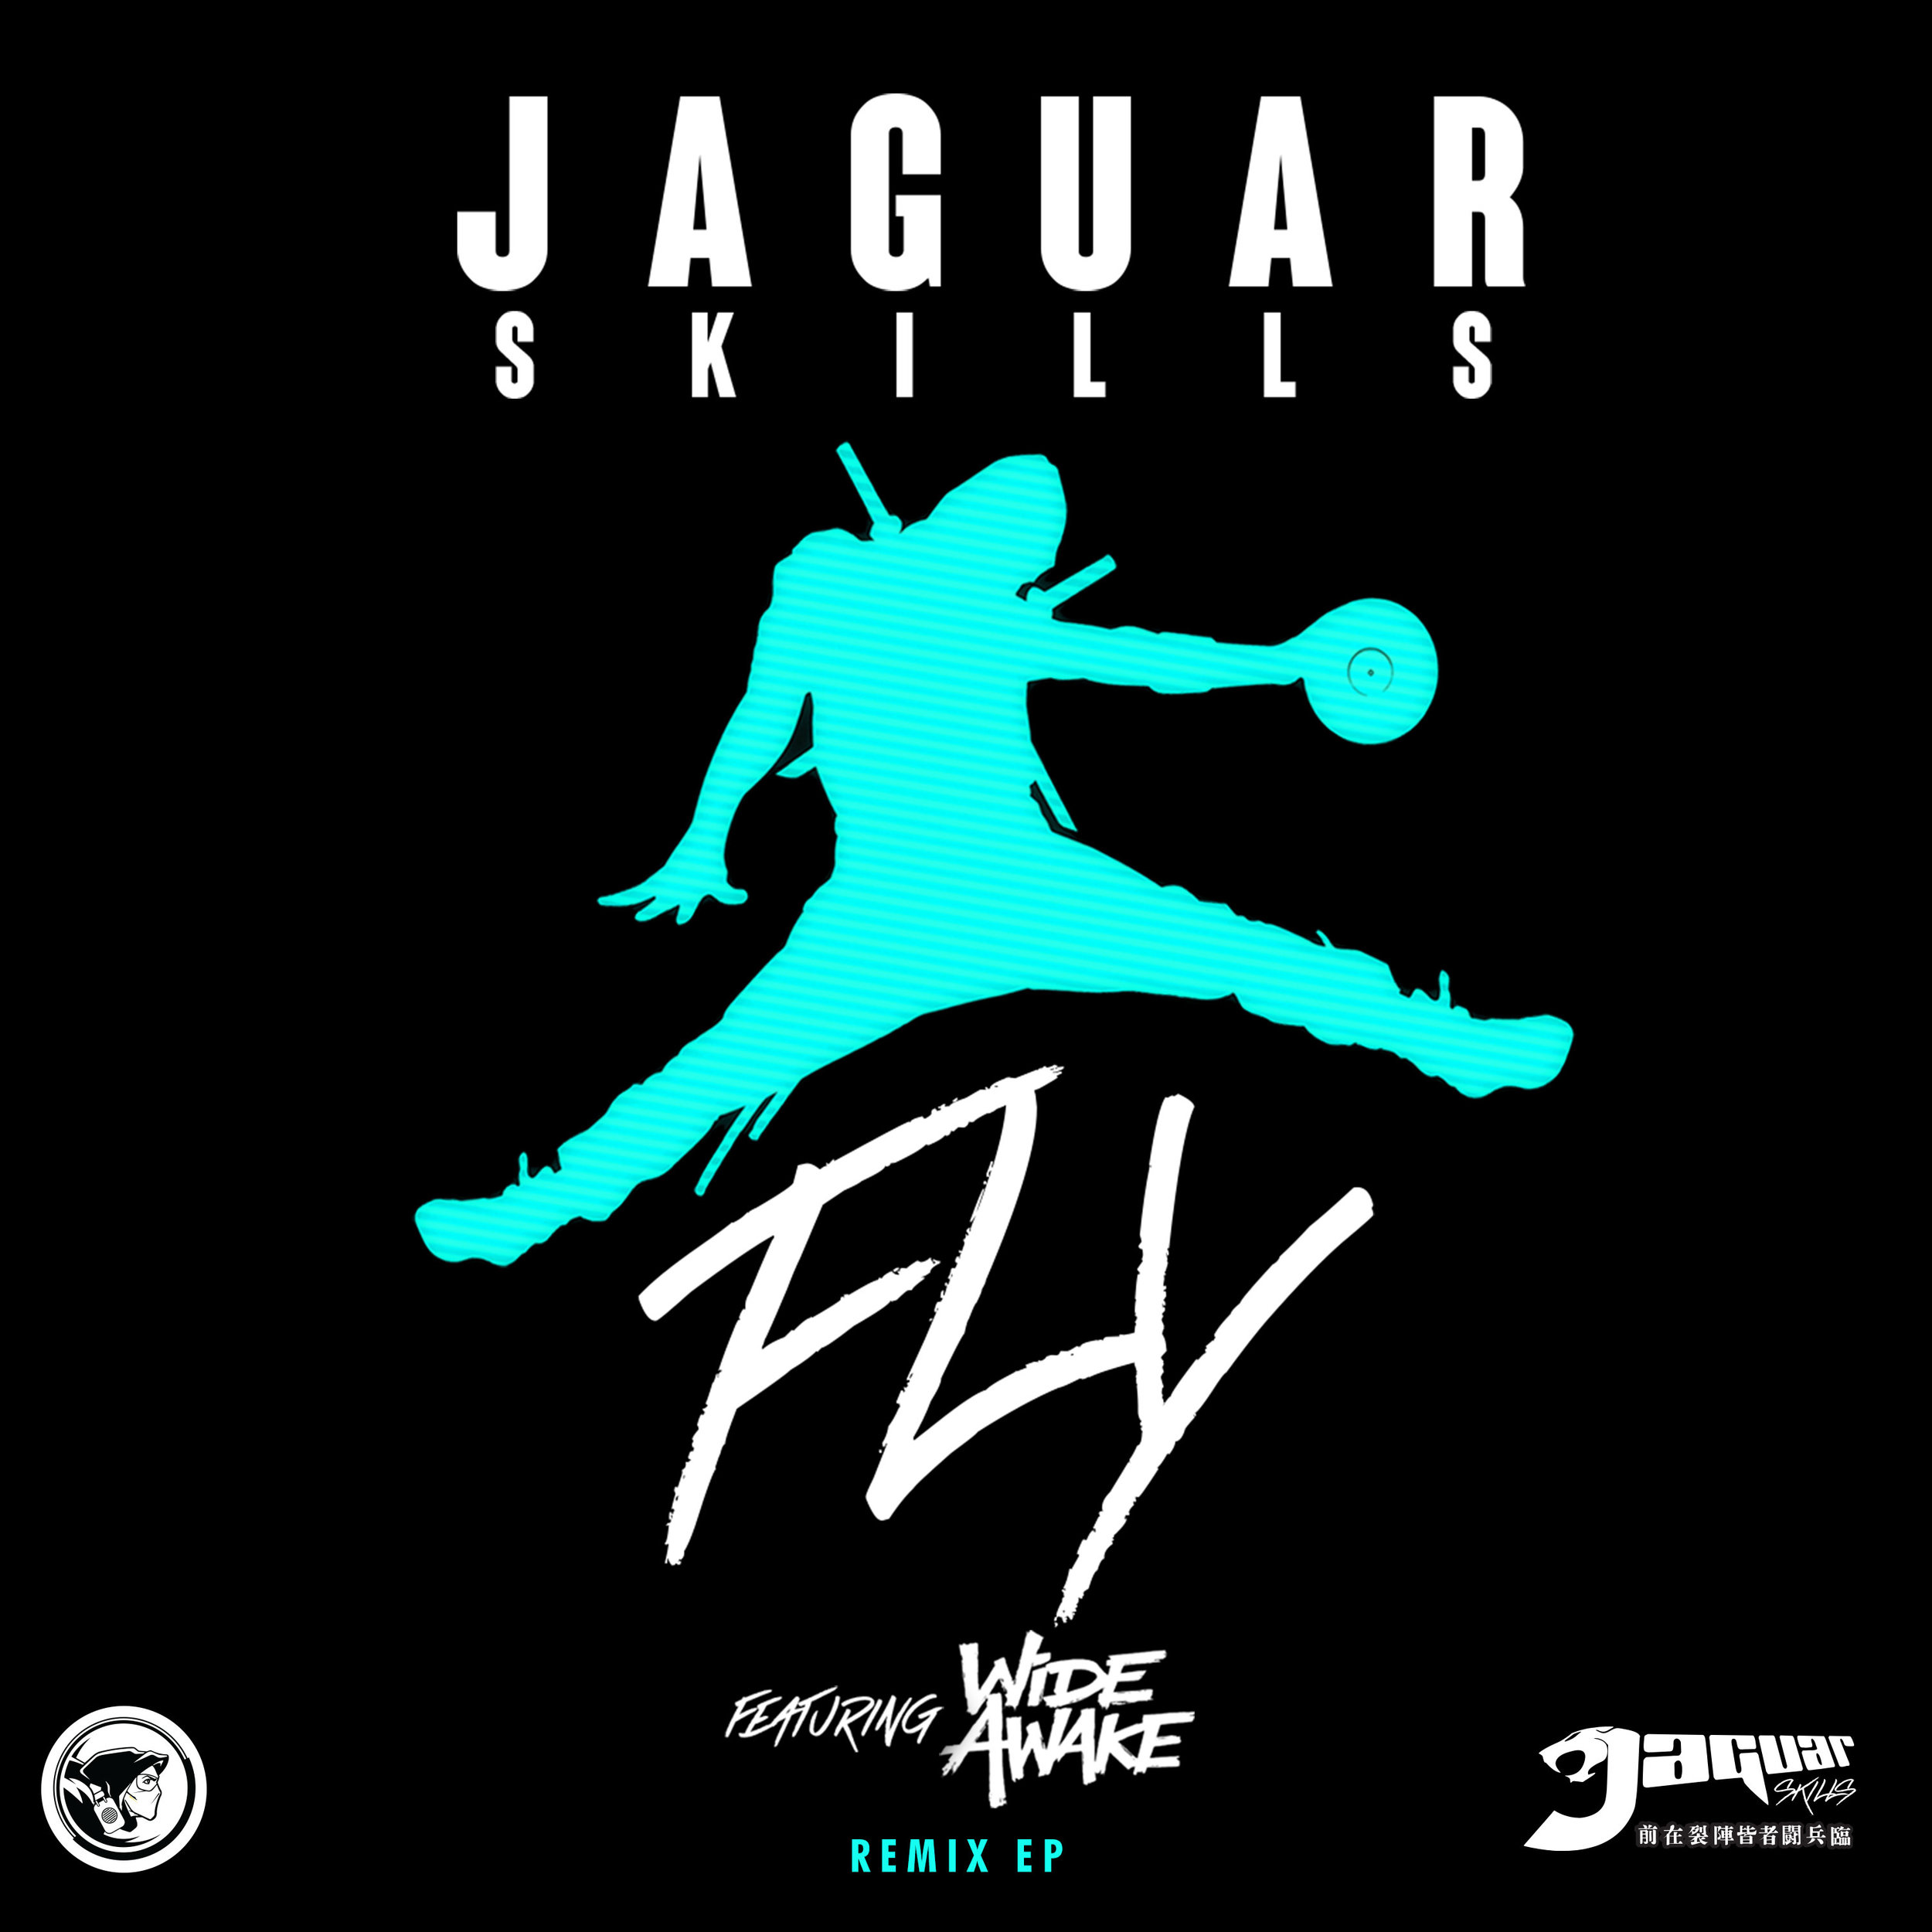 JaguarSkills_Fly_RemixEP.jpg